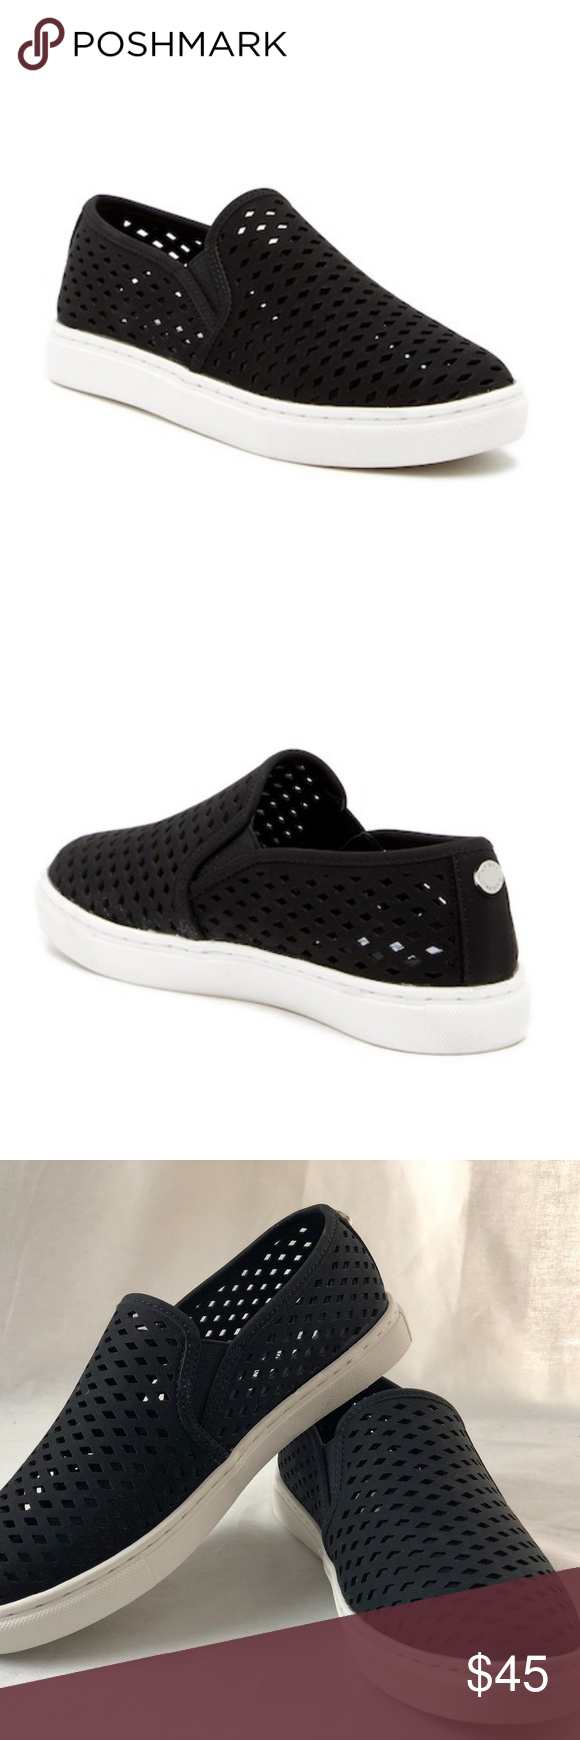 a9b7eb26cbf Steve Madden Zeena Slip-On Sneaker Steve Madden Zeena Slip-On Sneaker.  Condition  New without box. Size  Women s 8.5 Details Sizing  Runs small   ...